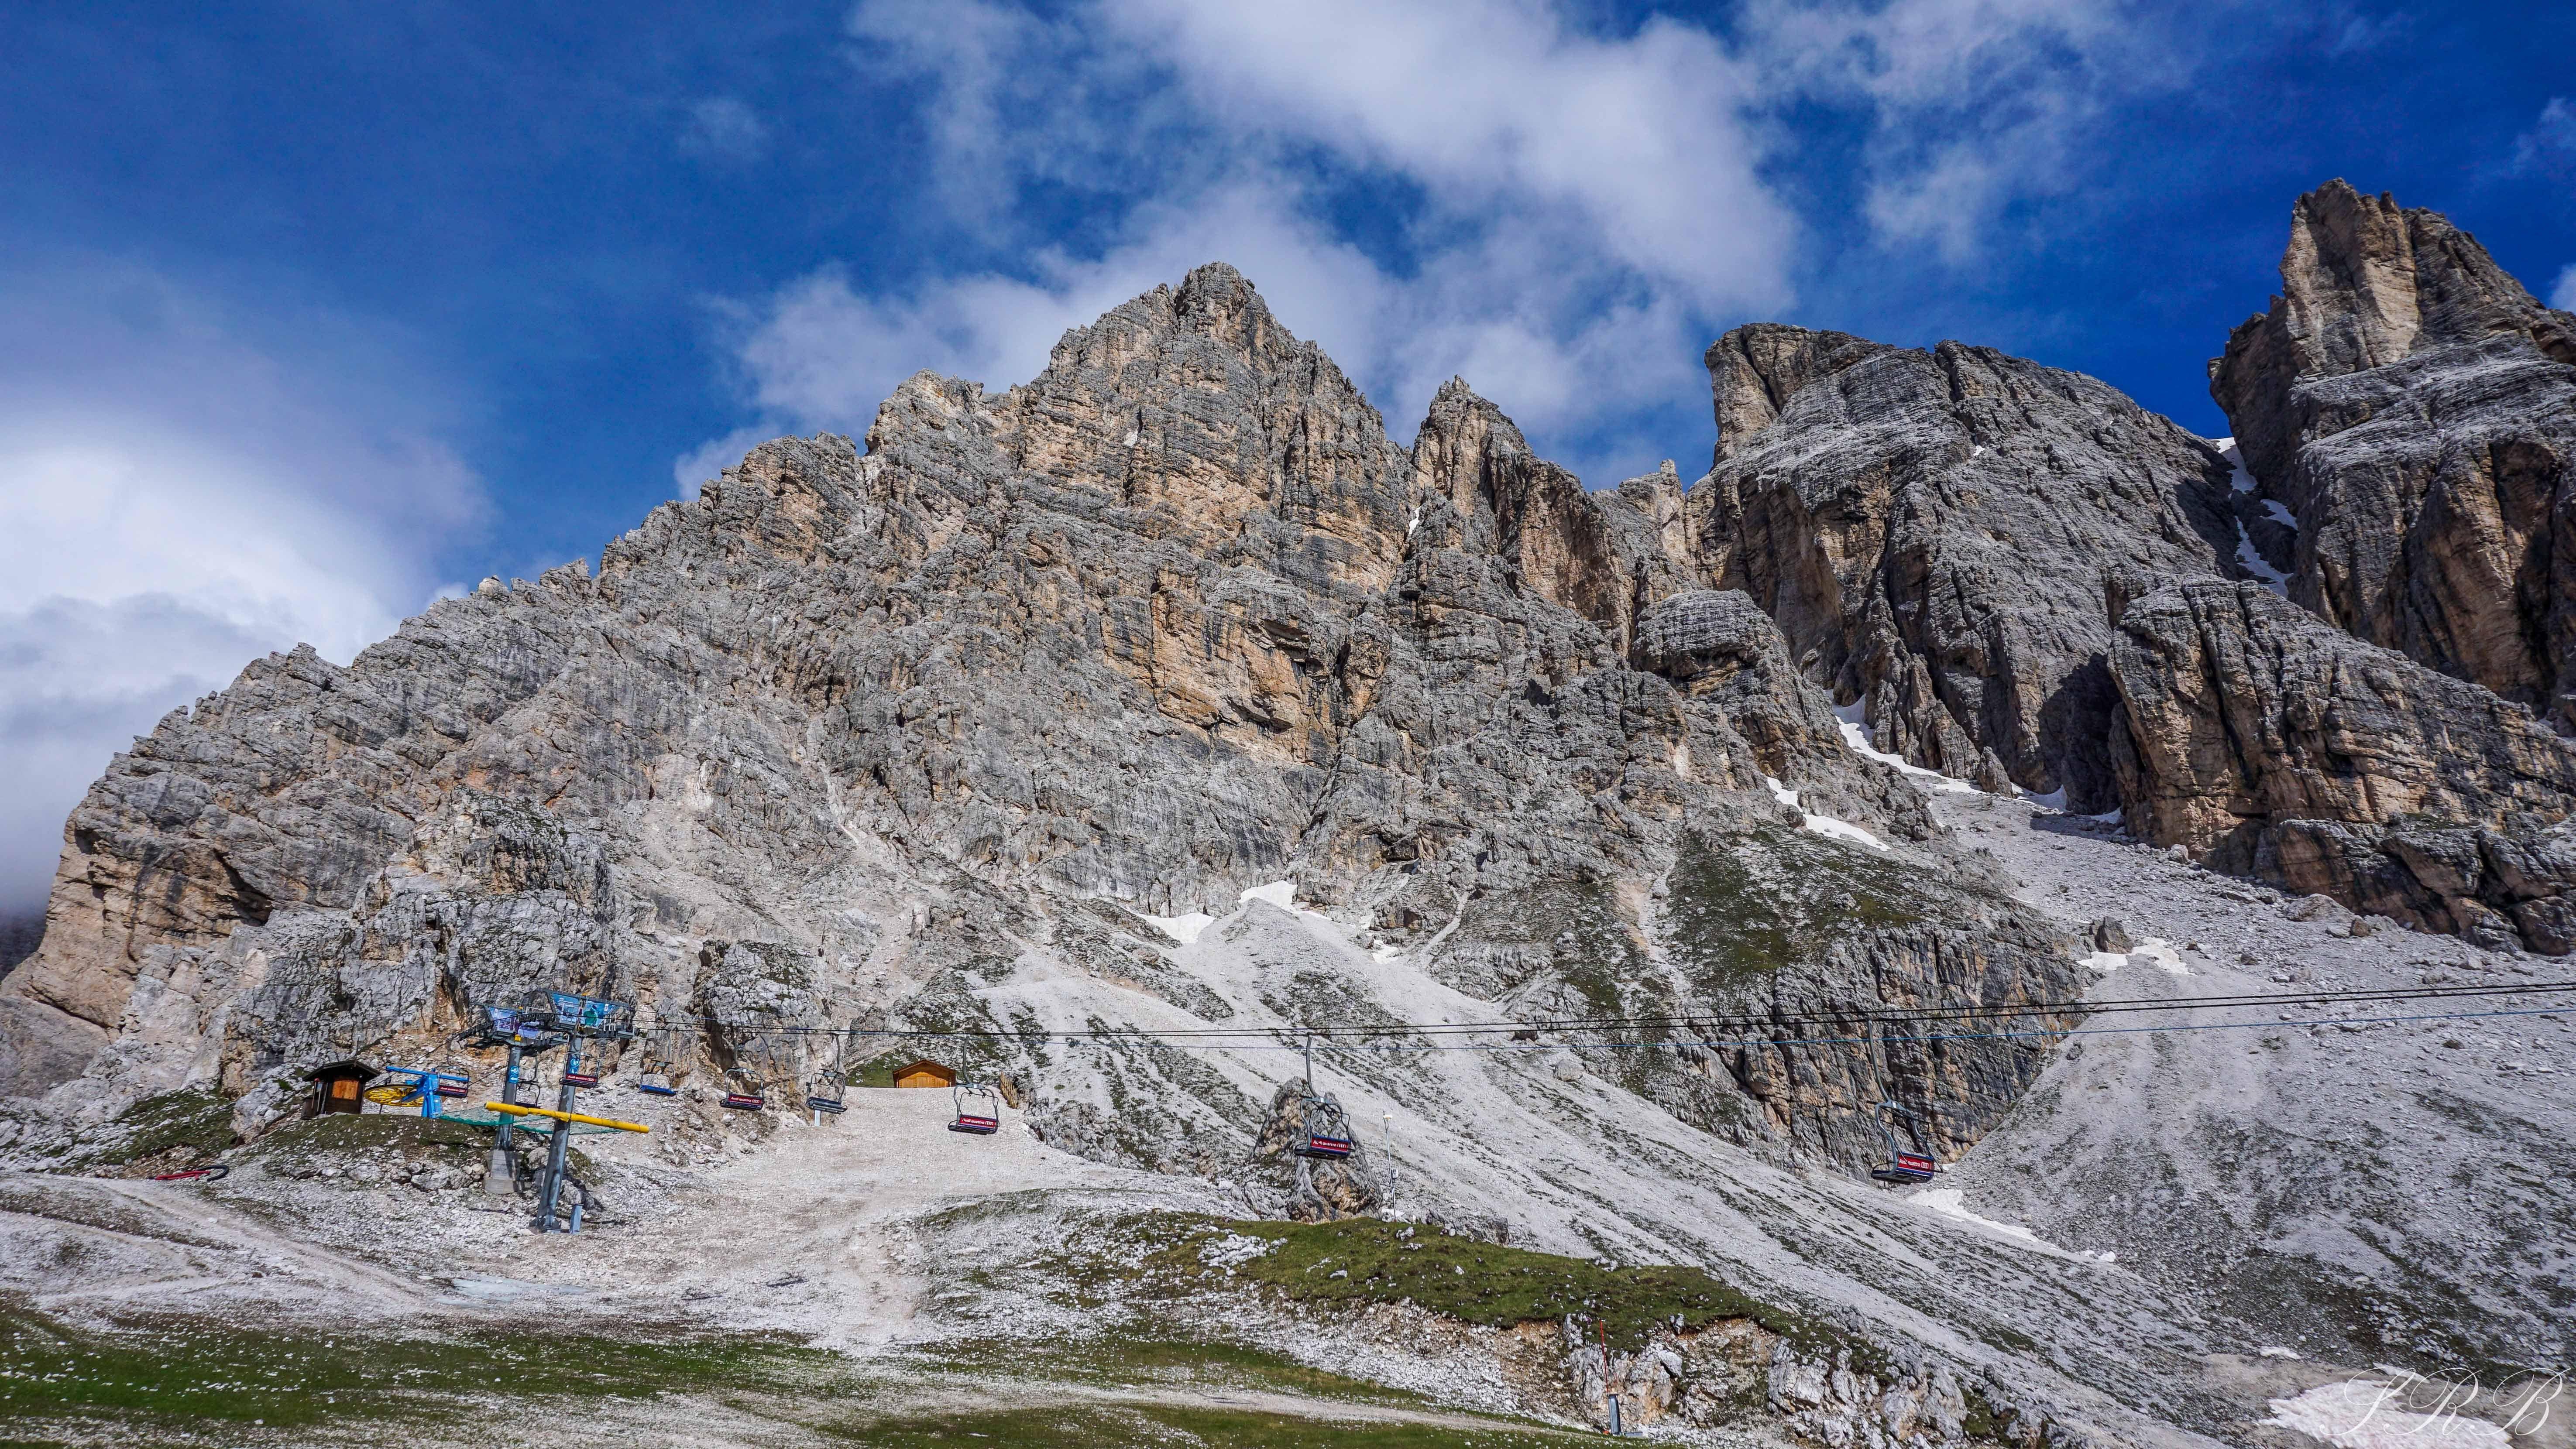 A LifeAltering Climb Small towns, Climbing, Mount rushmore